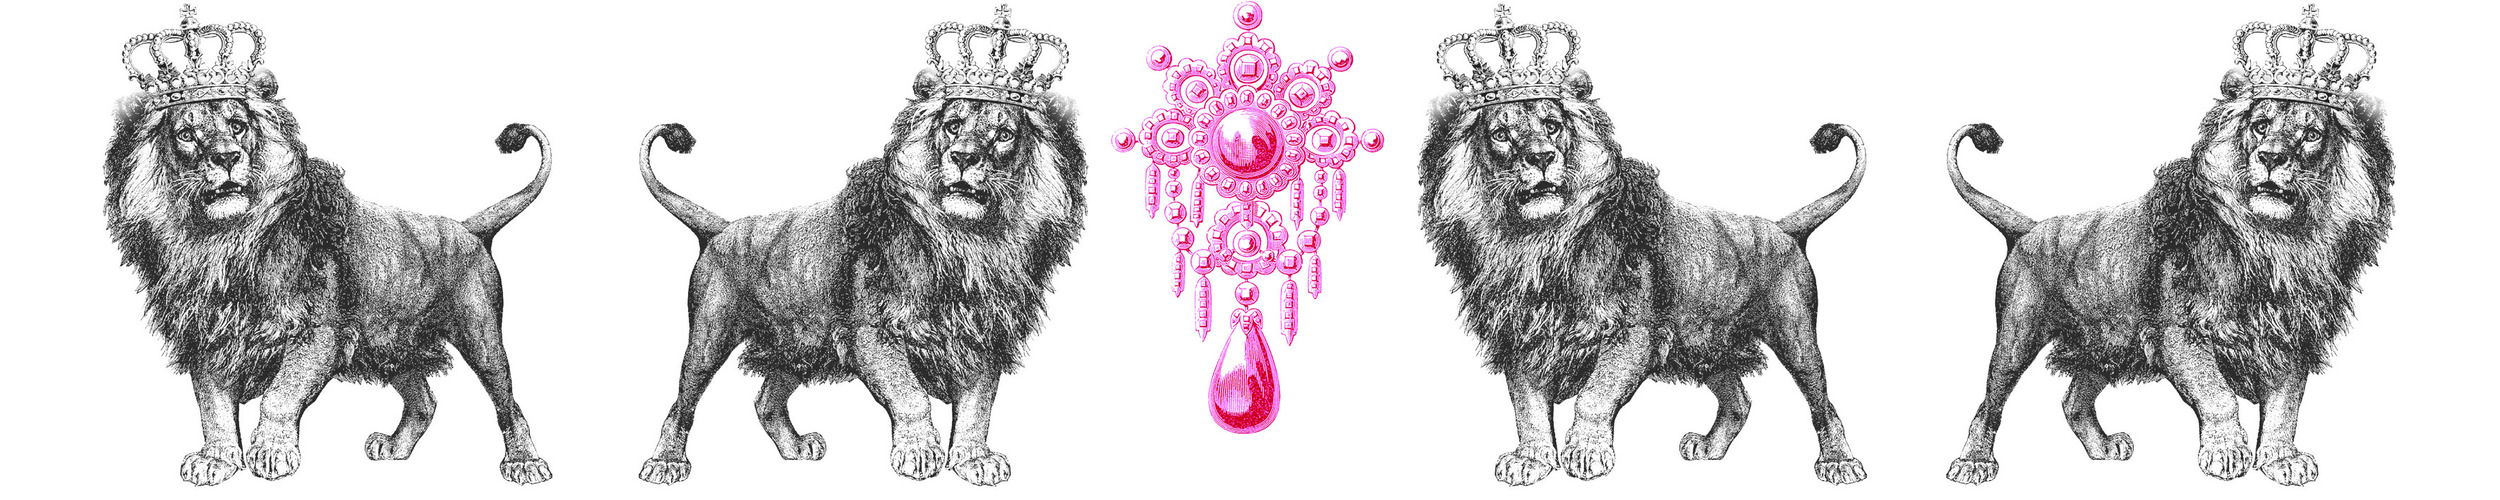 lions and pendants 2.jpg